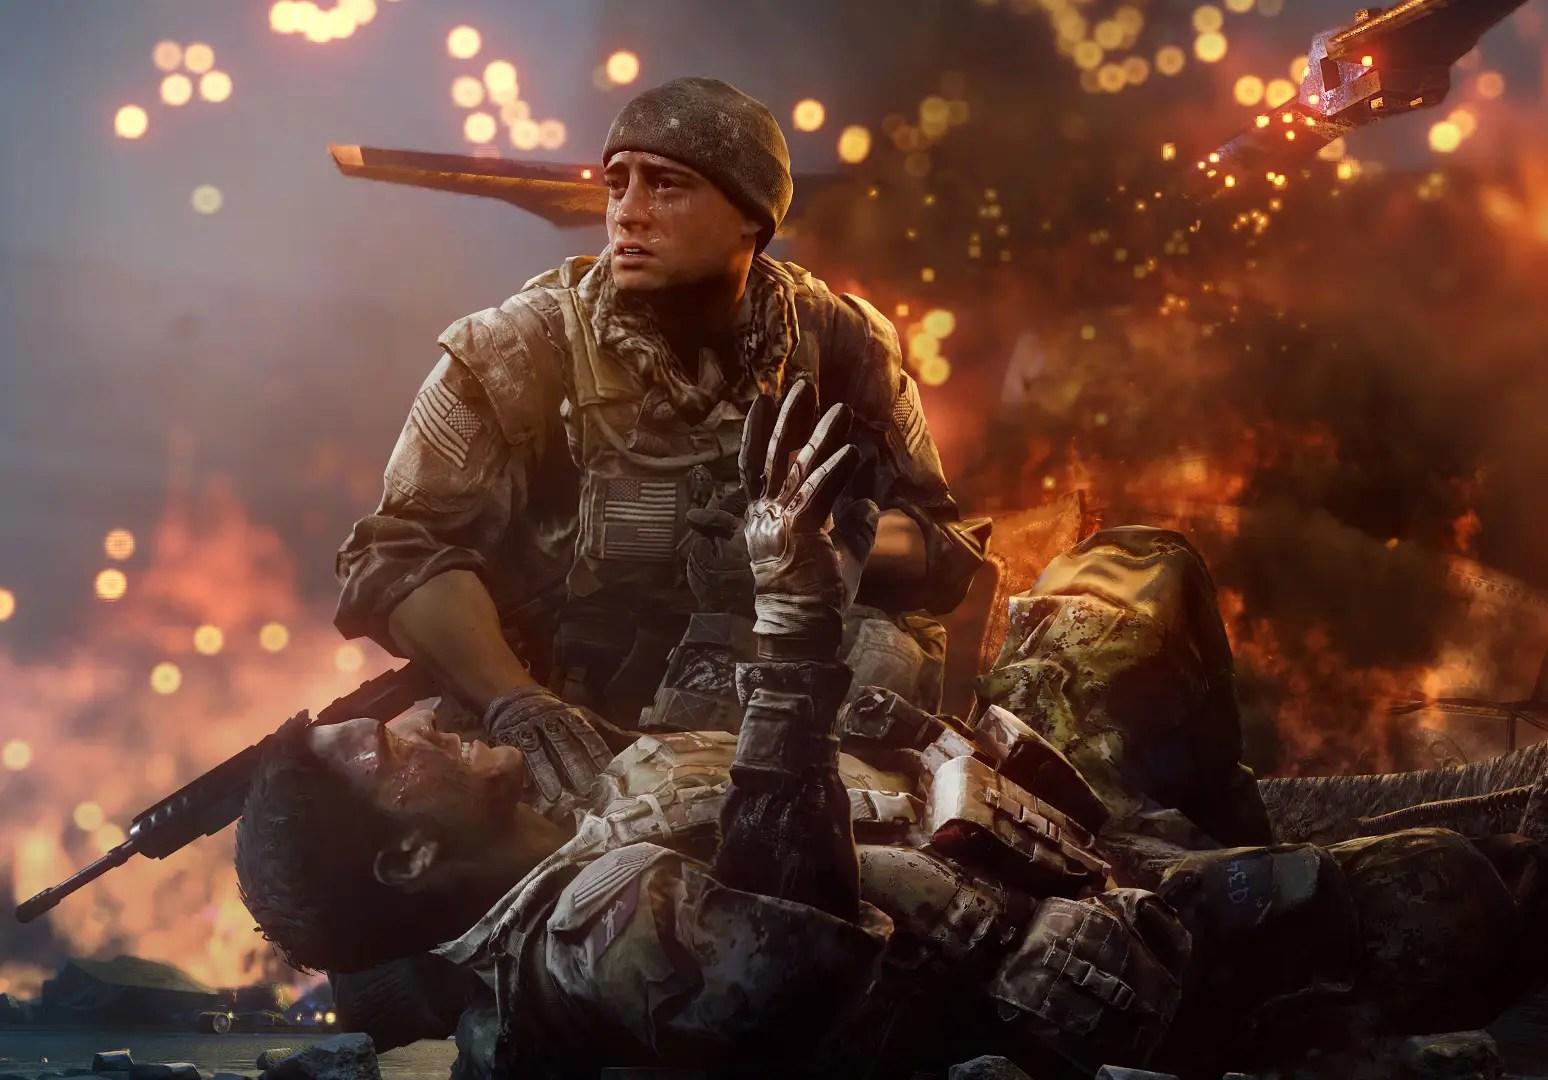 Battlefield 4, electronic arts